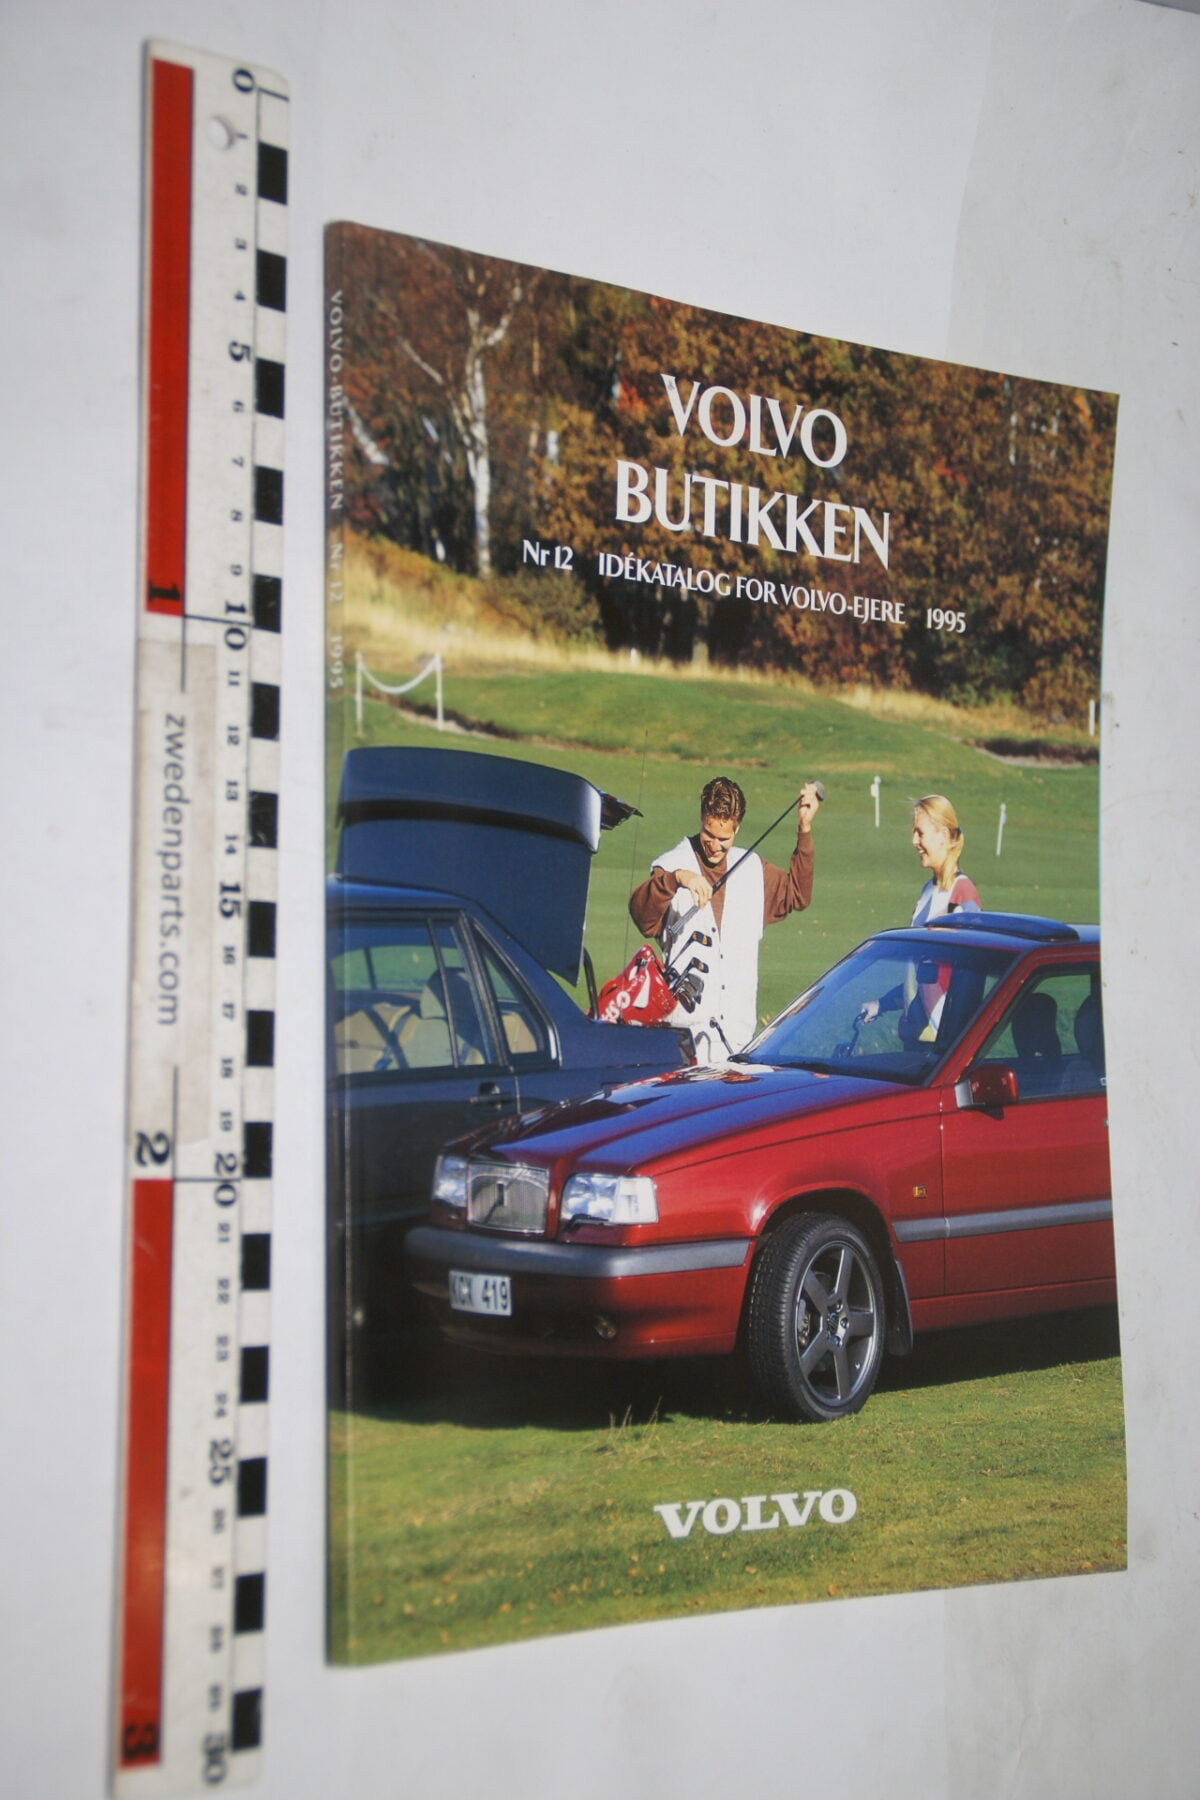 DSC02265 1995 origineel boek Volvo boetiek, Svensk-0055f6bd